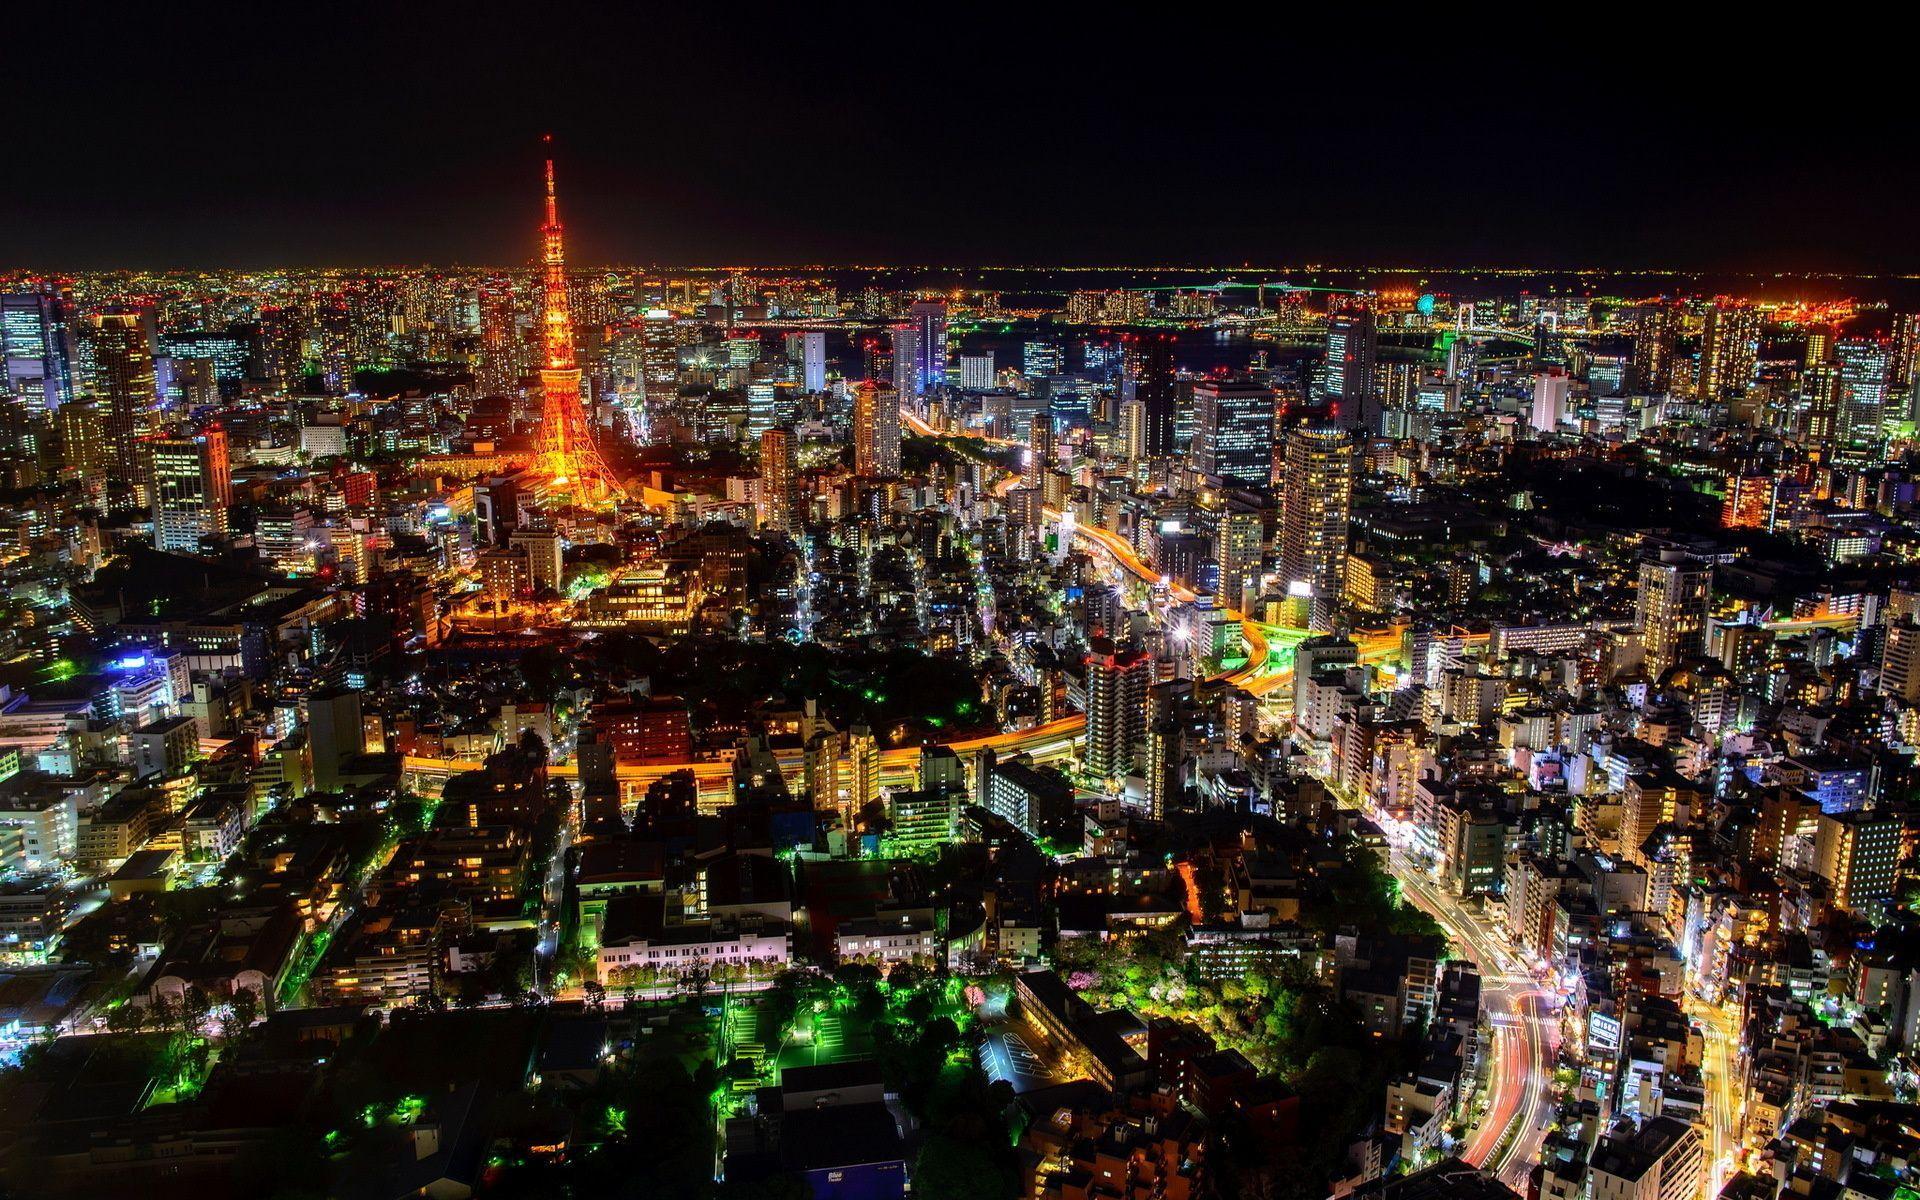 Akira Neo Tokyo Wallpapers - Top Free Akira Neo Tokyo ...